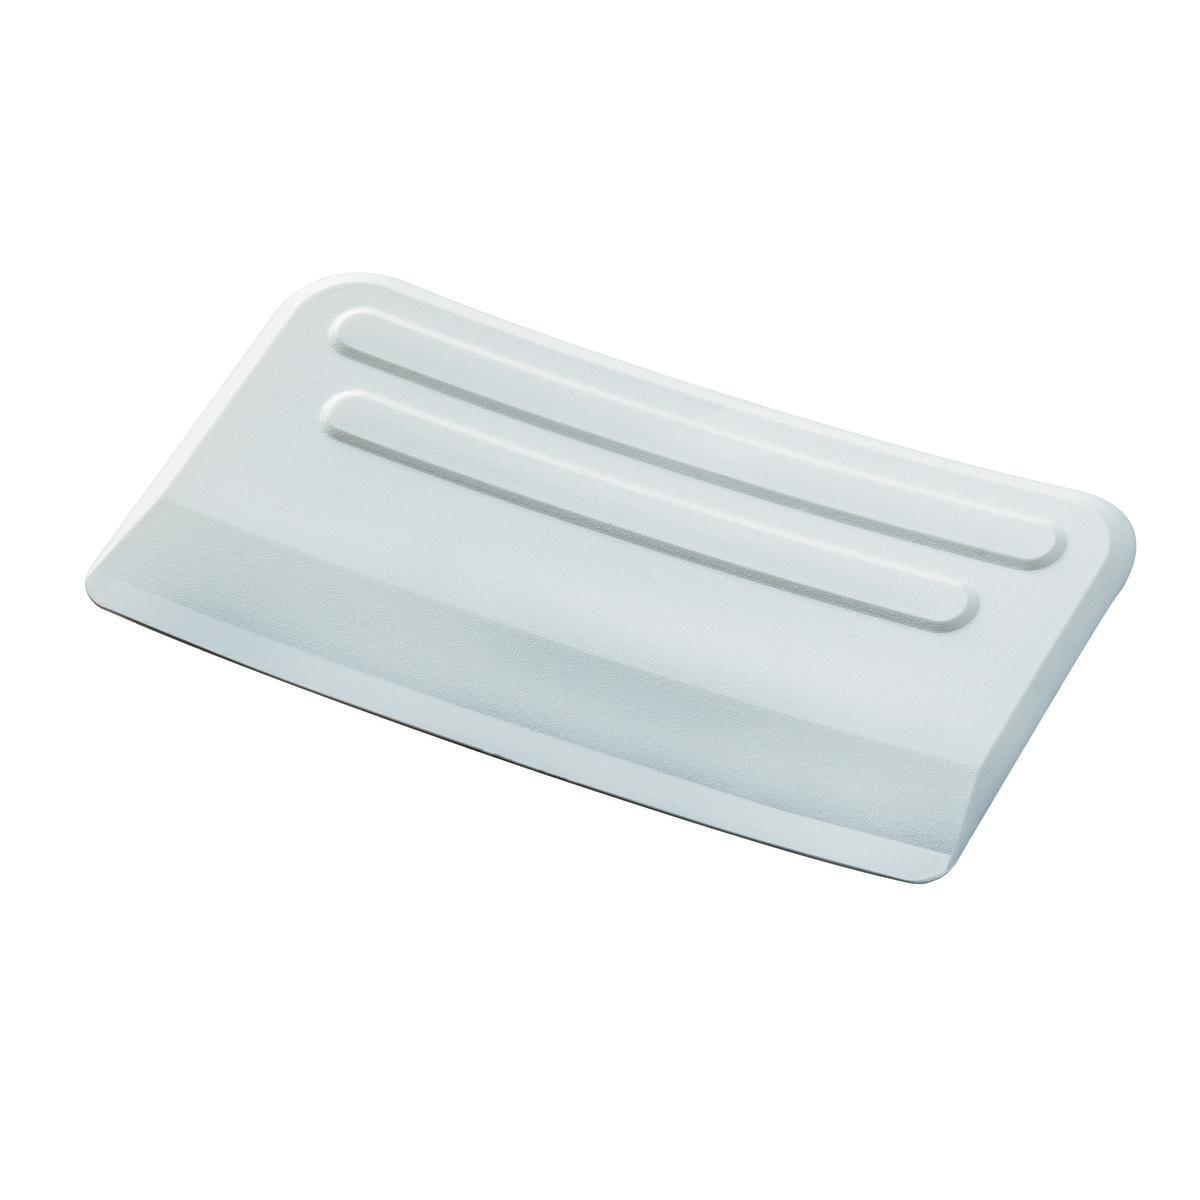 Vaschetta per lavello bianco L 32.5 x P 9 x H 17.5 cm - 1